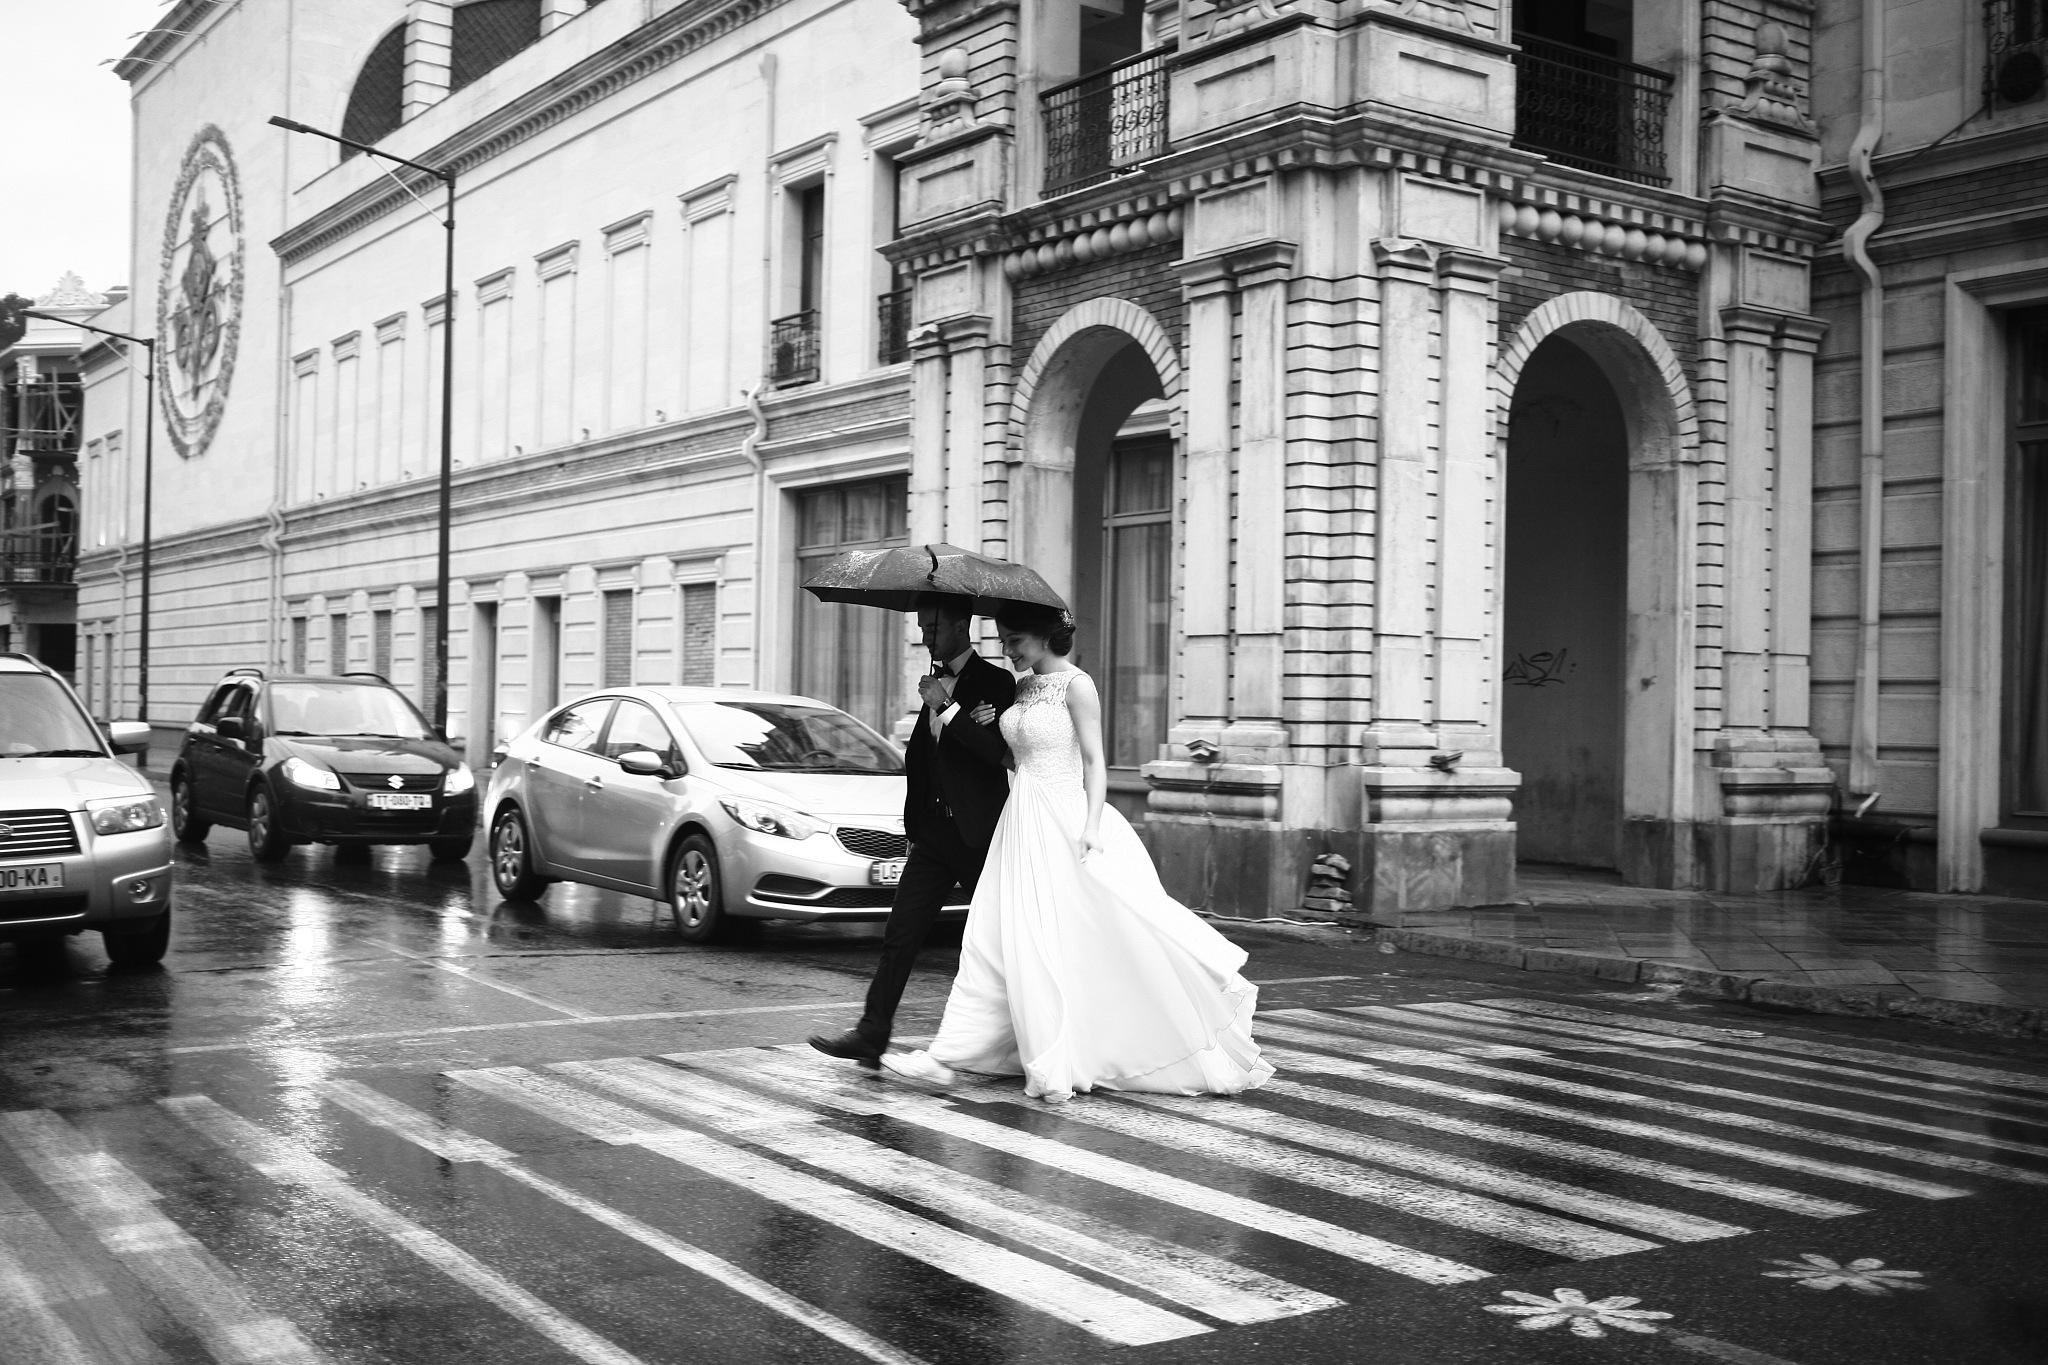 Untitled by Amiko Beridze